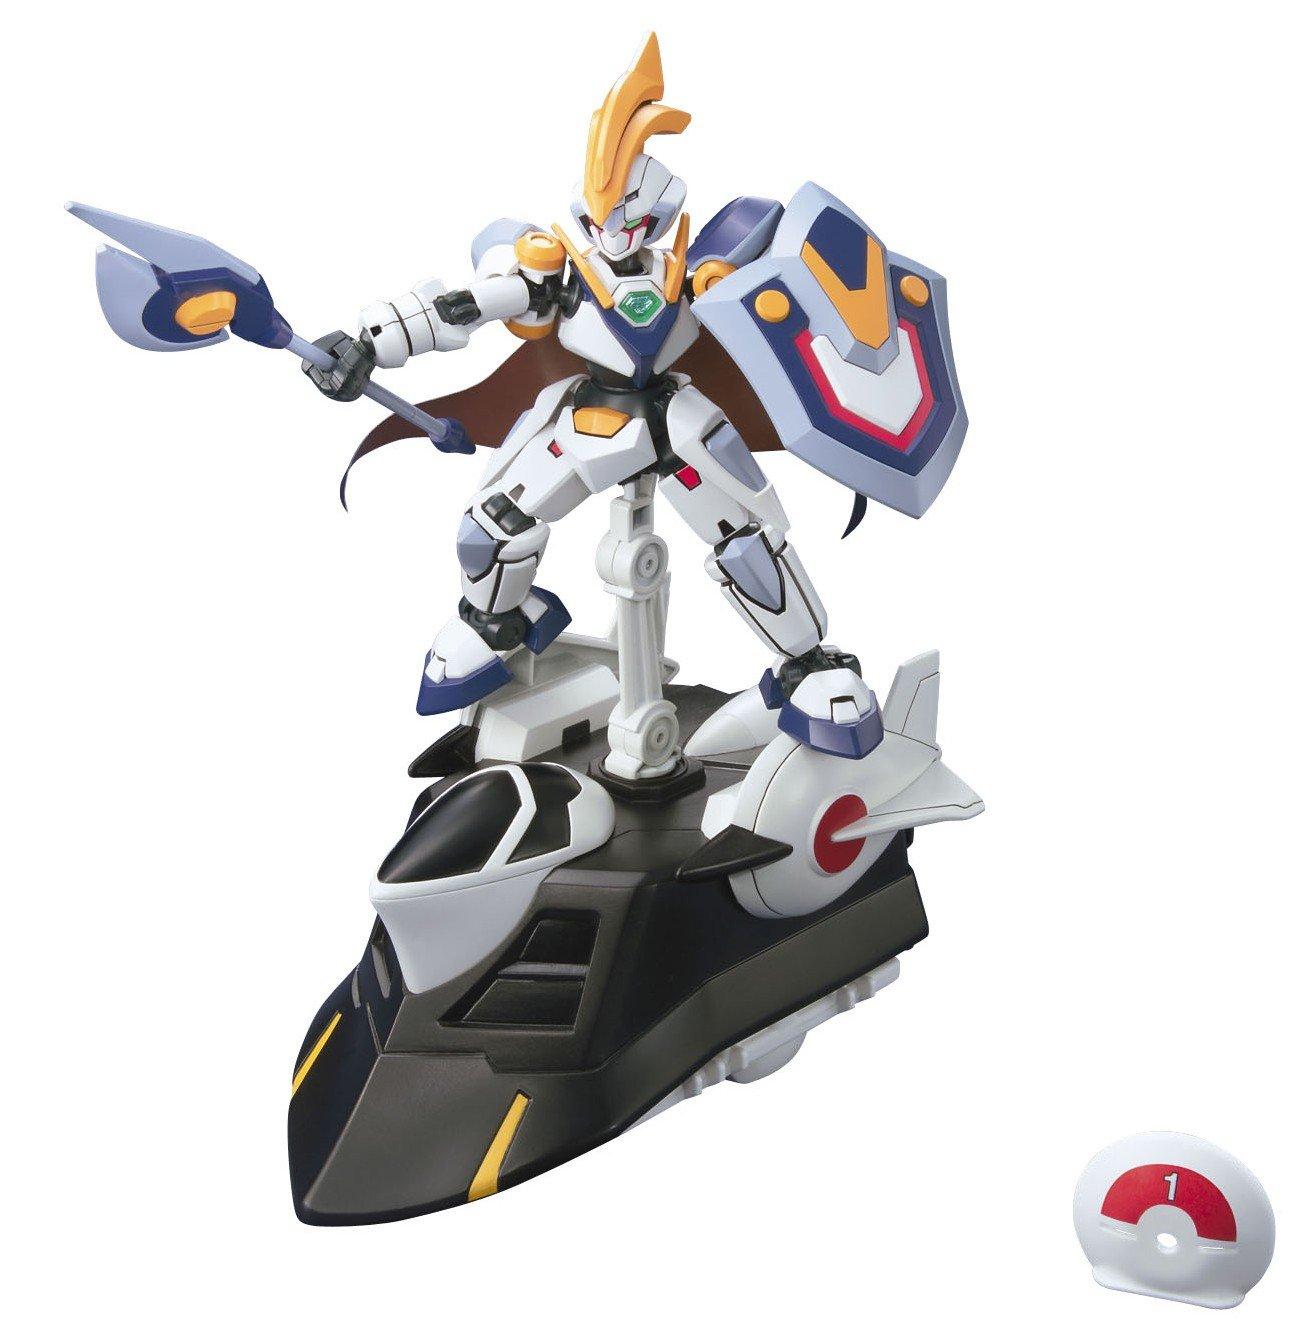 LBX Elysion & RS (1/1 scale Plastic model kit) Bandai The Little Battlers Non [JAPAN] (japan import)